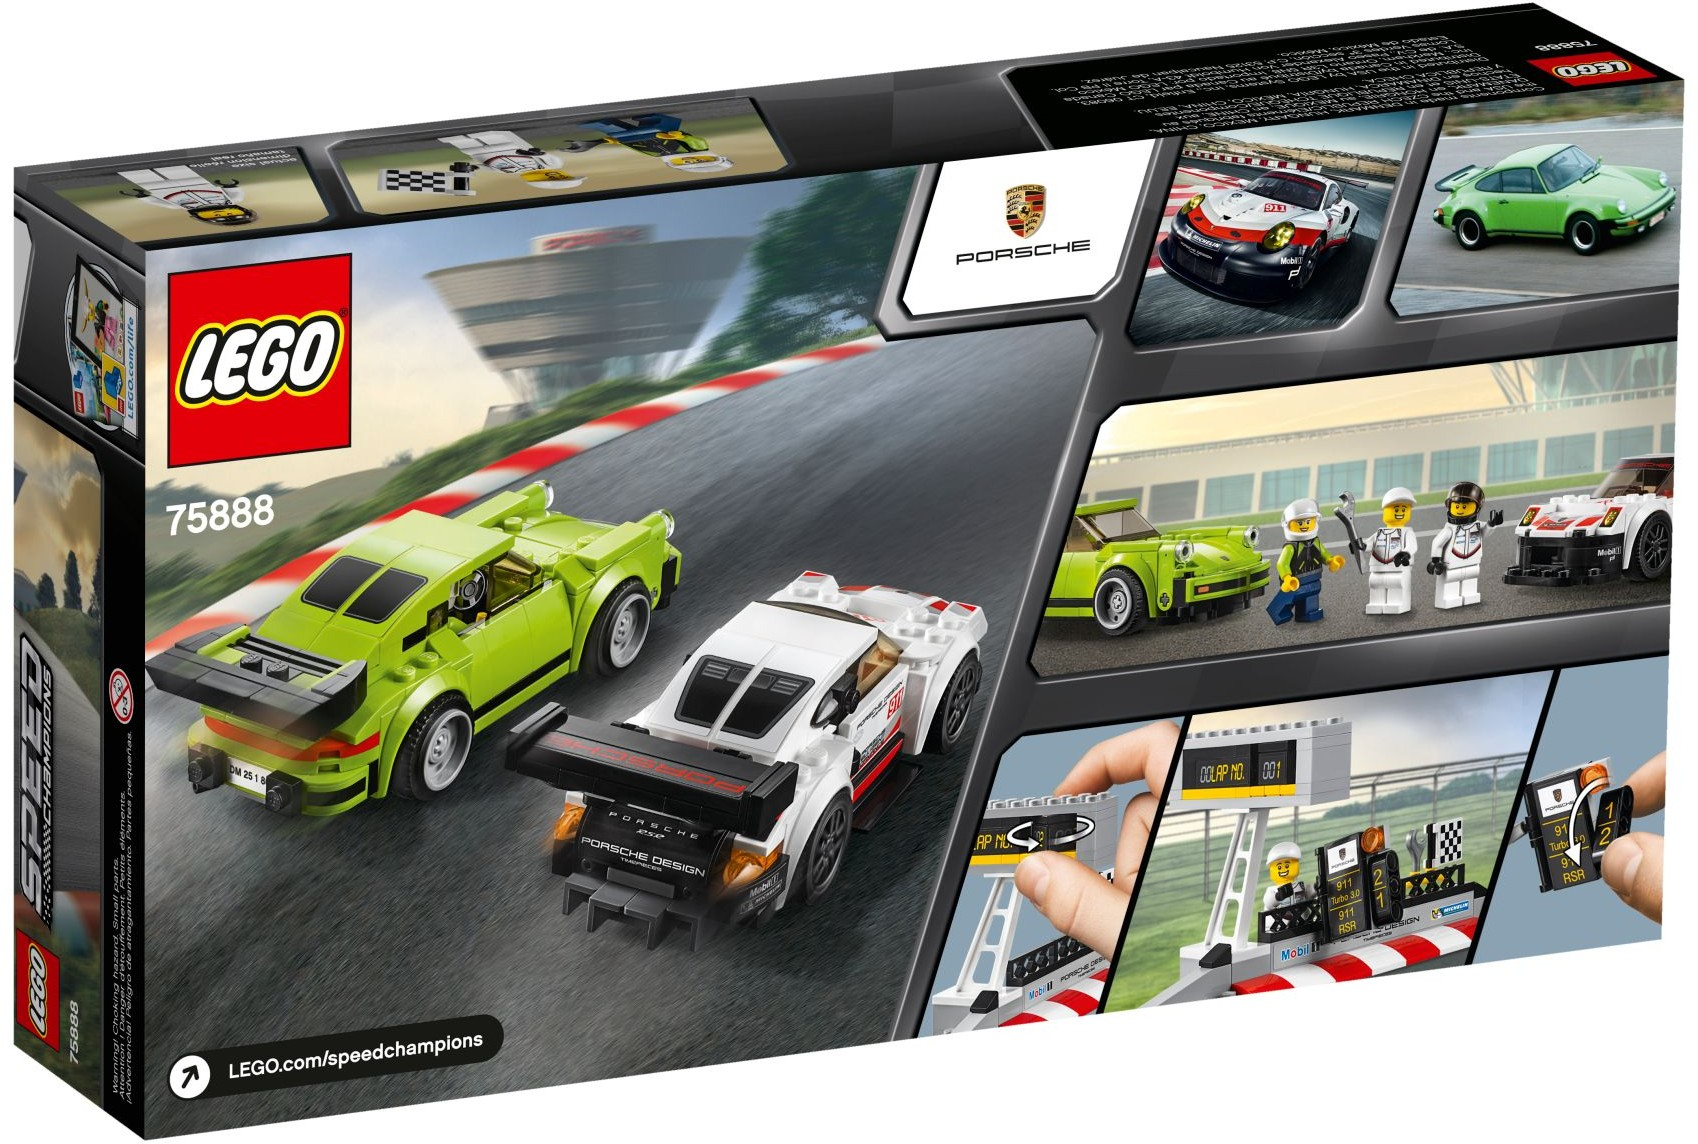 75888 LEGO Porsche 911 RSR and 911 Turbo 3.0 - Siêu xe